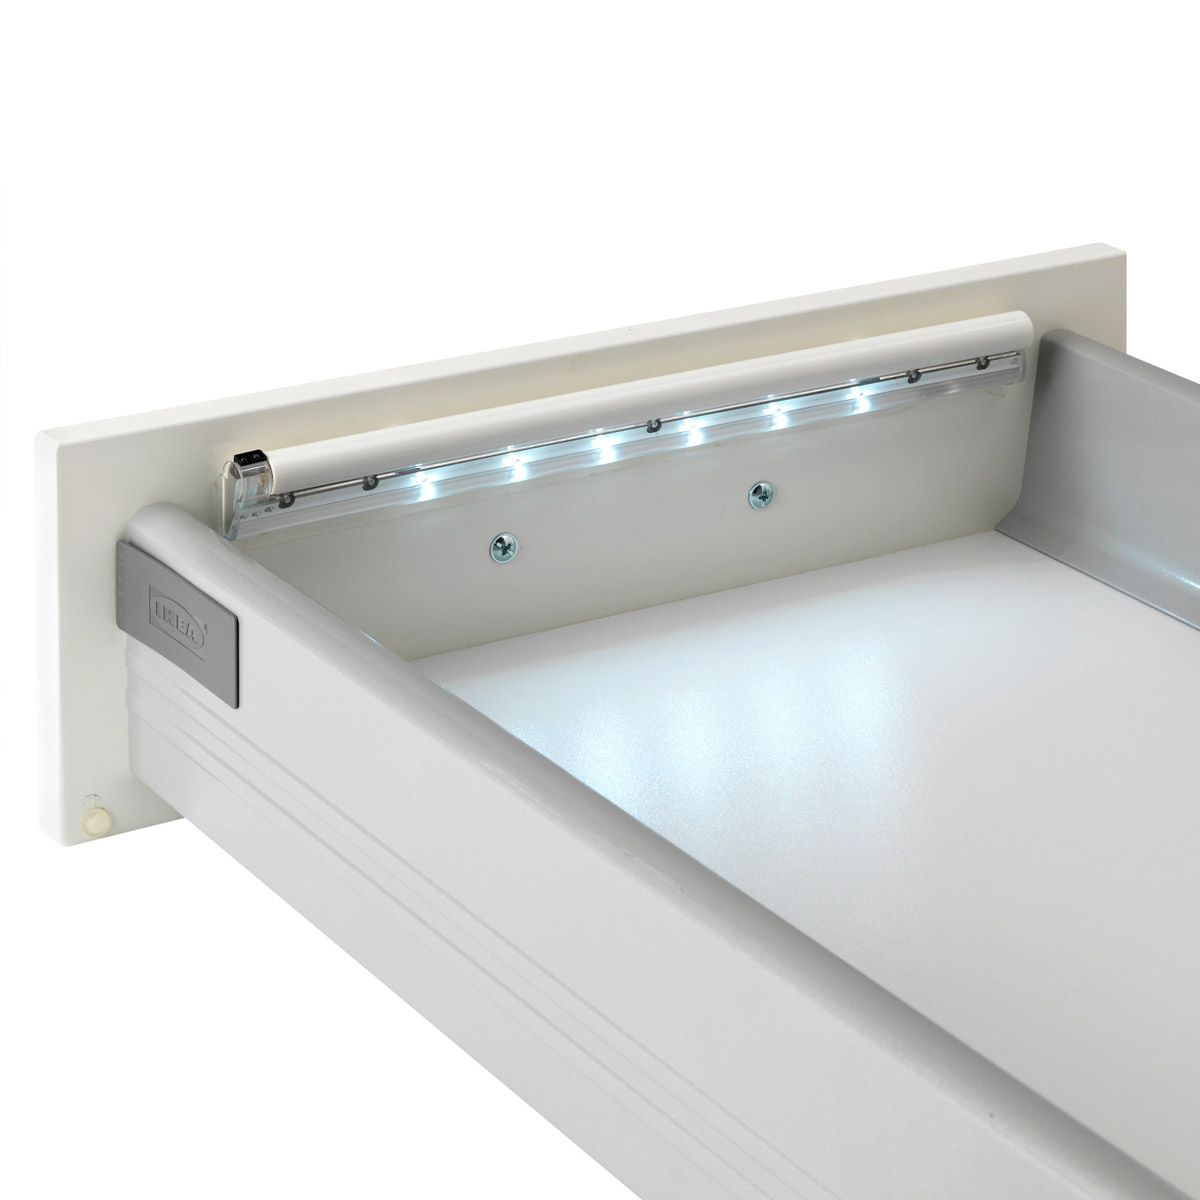 New ikea led lamp for illuminating storage drawers di - Ikea iluminacion interior ...